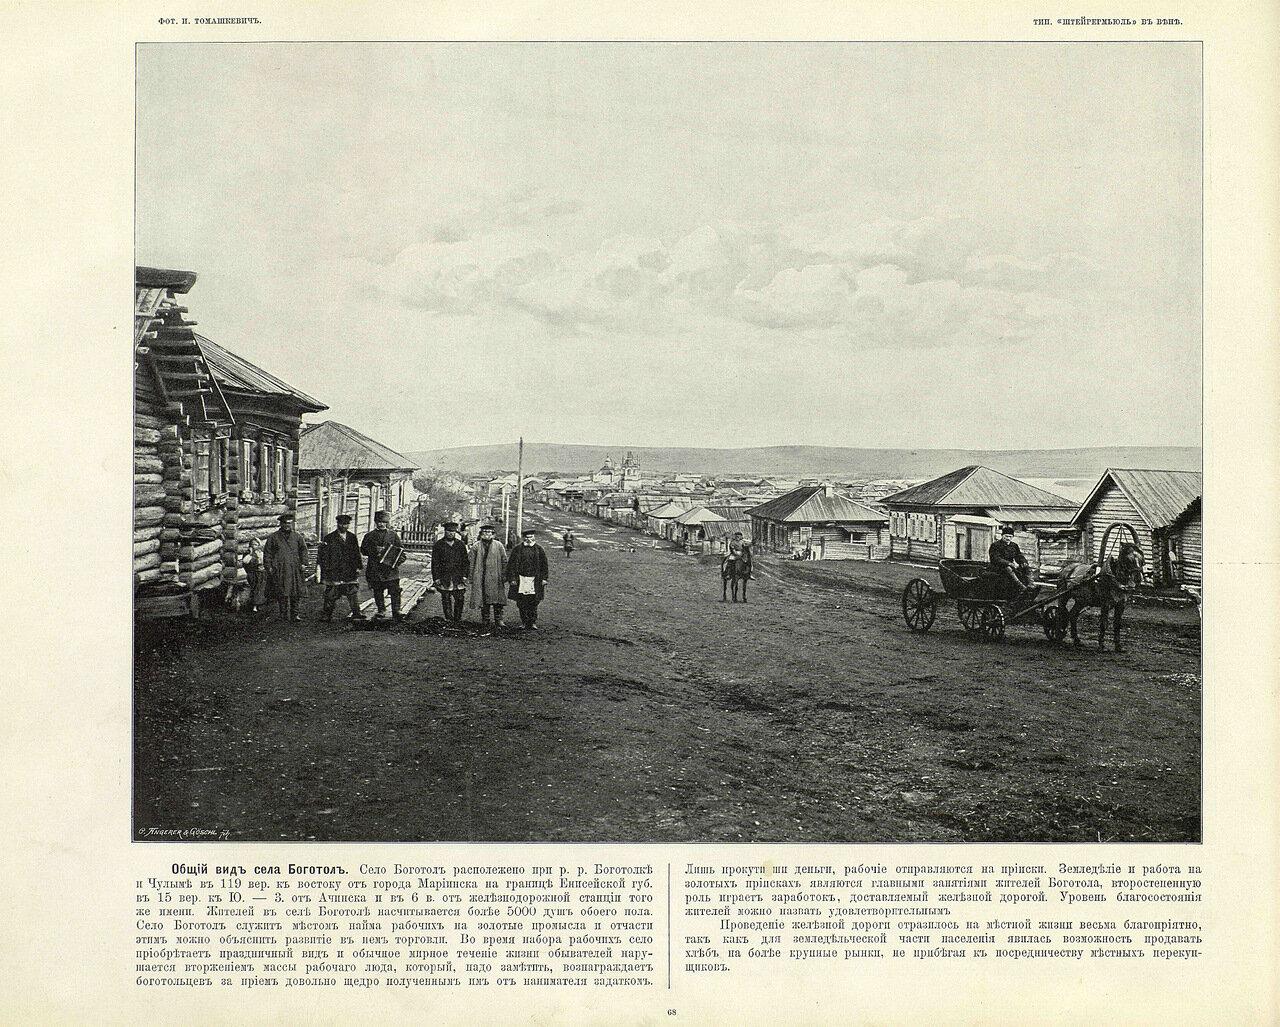 68. Общий вид села Боготол